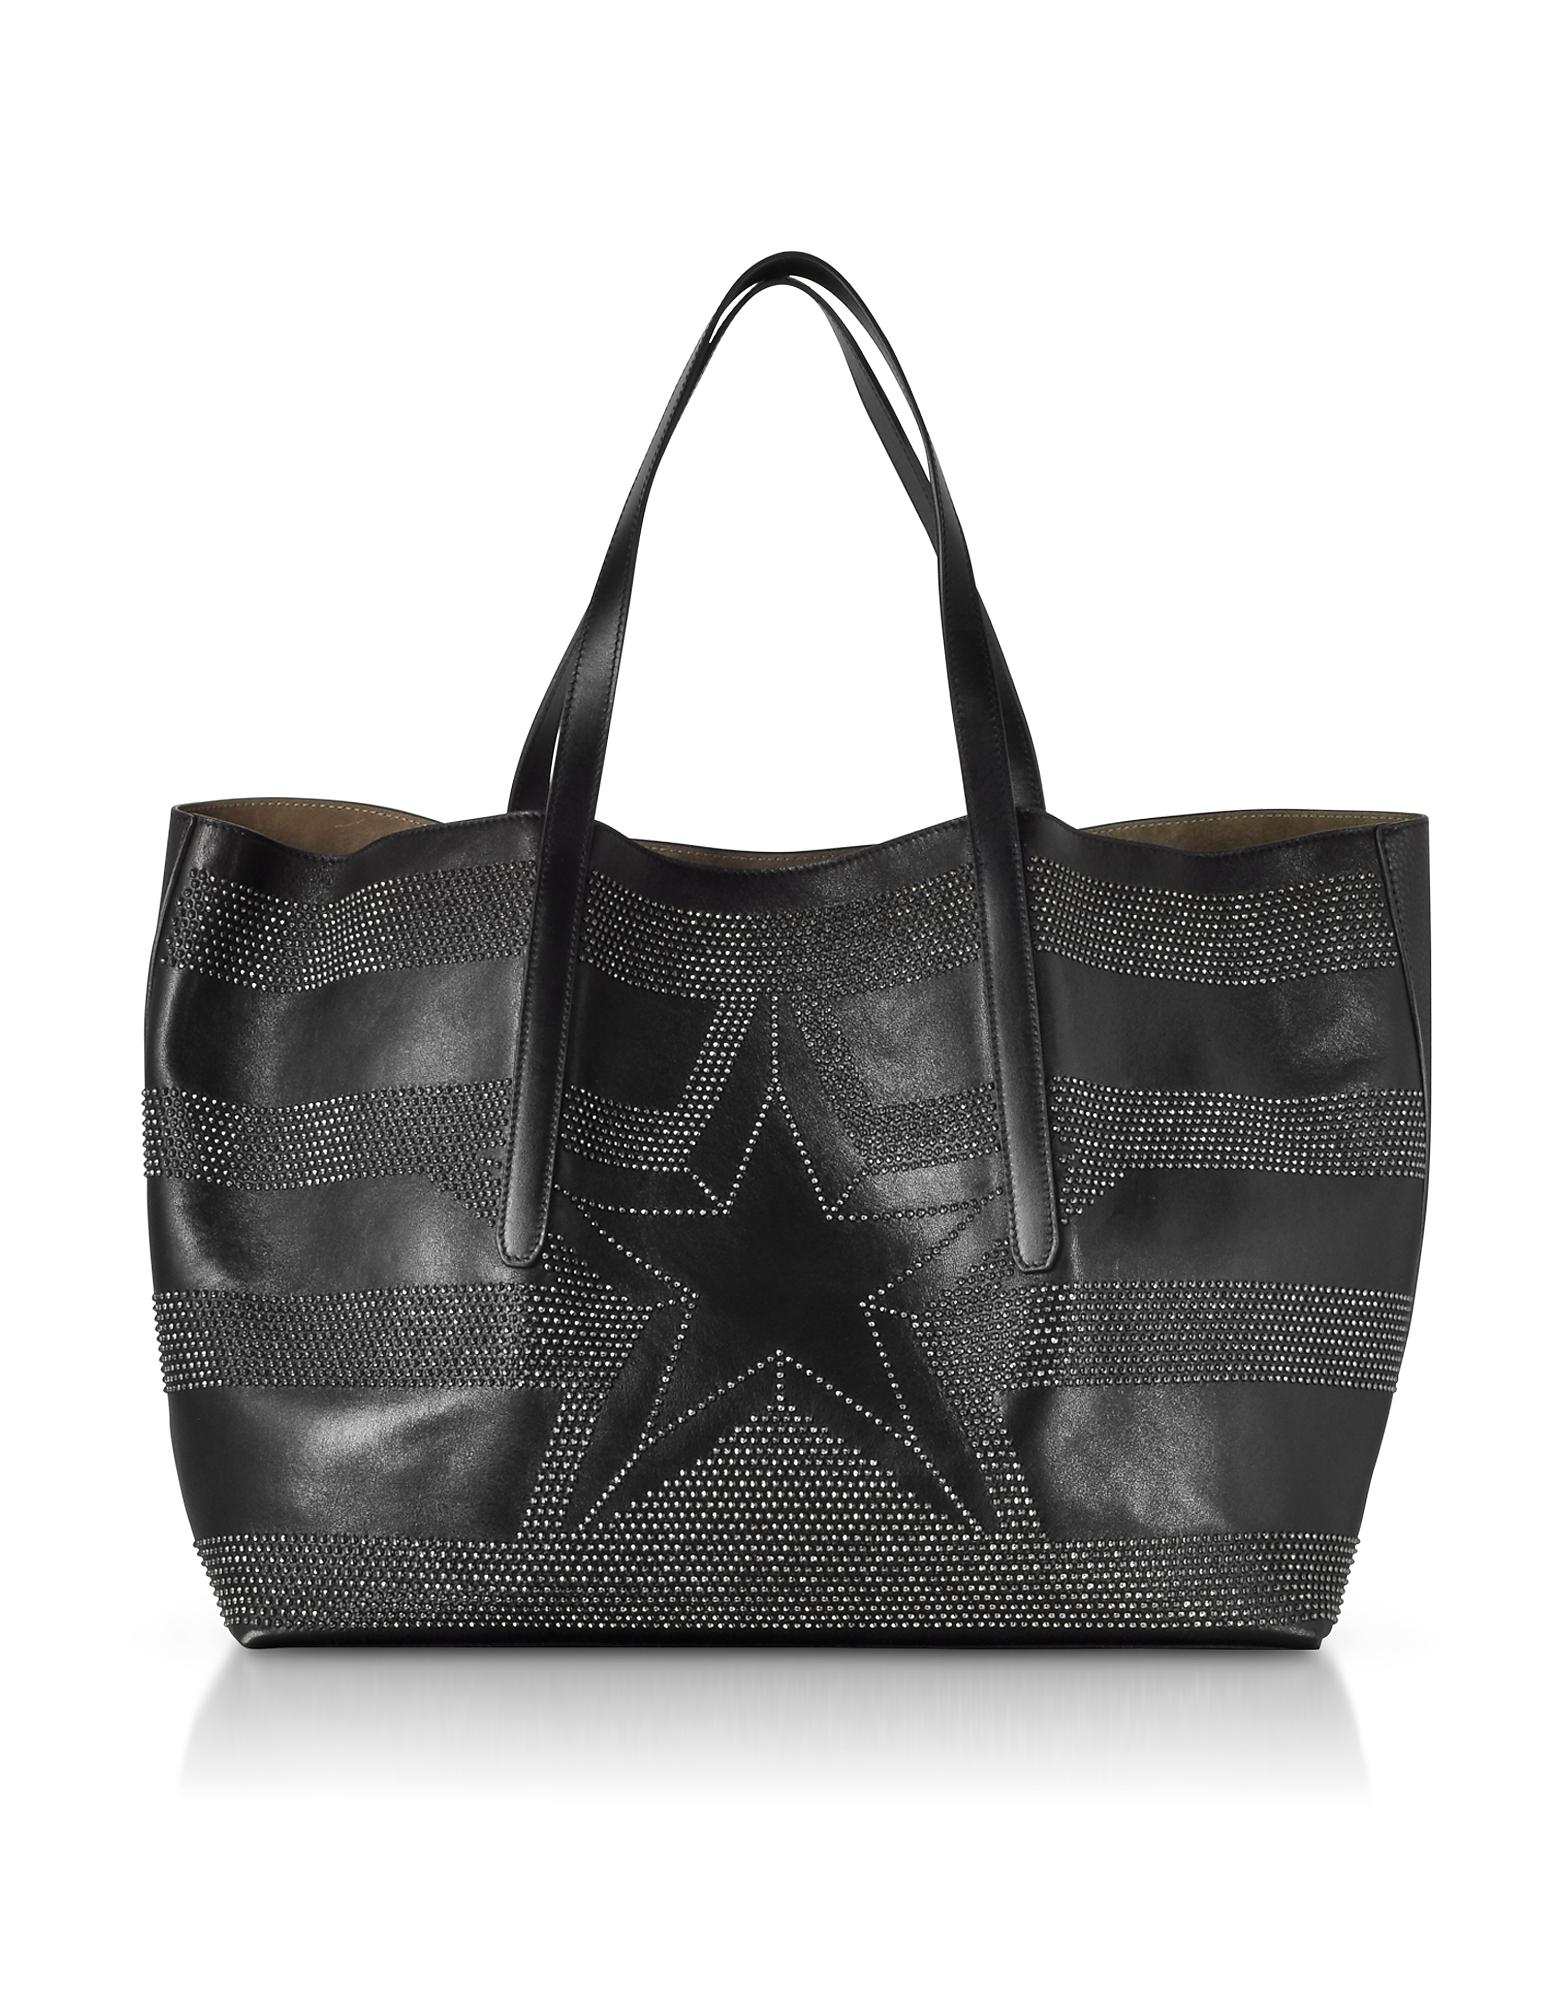 Jimmy Choo Handbags, Pimlico Tao Large Black Leather Tote